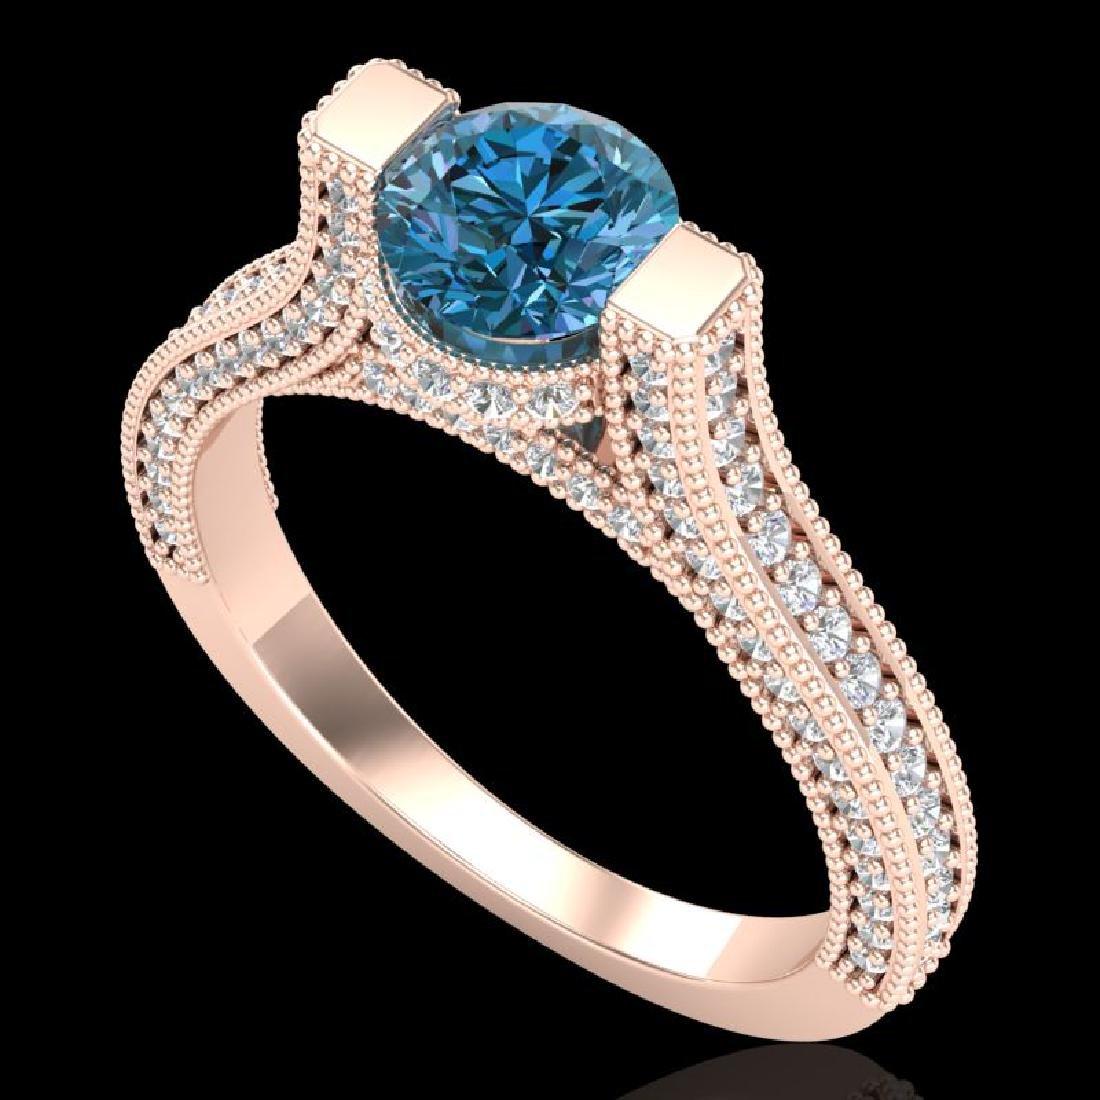 2 CTW Intense Blue Diamond Engagement Micro Pave Ring